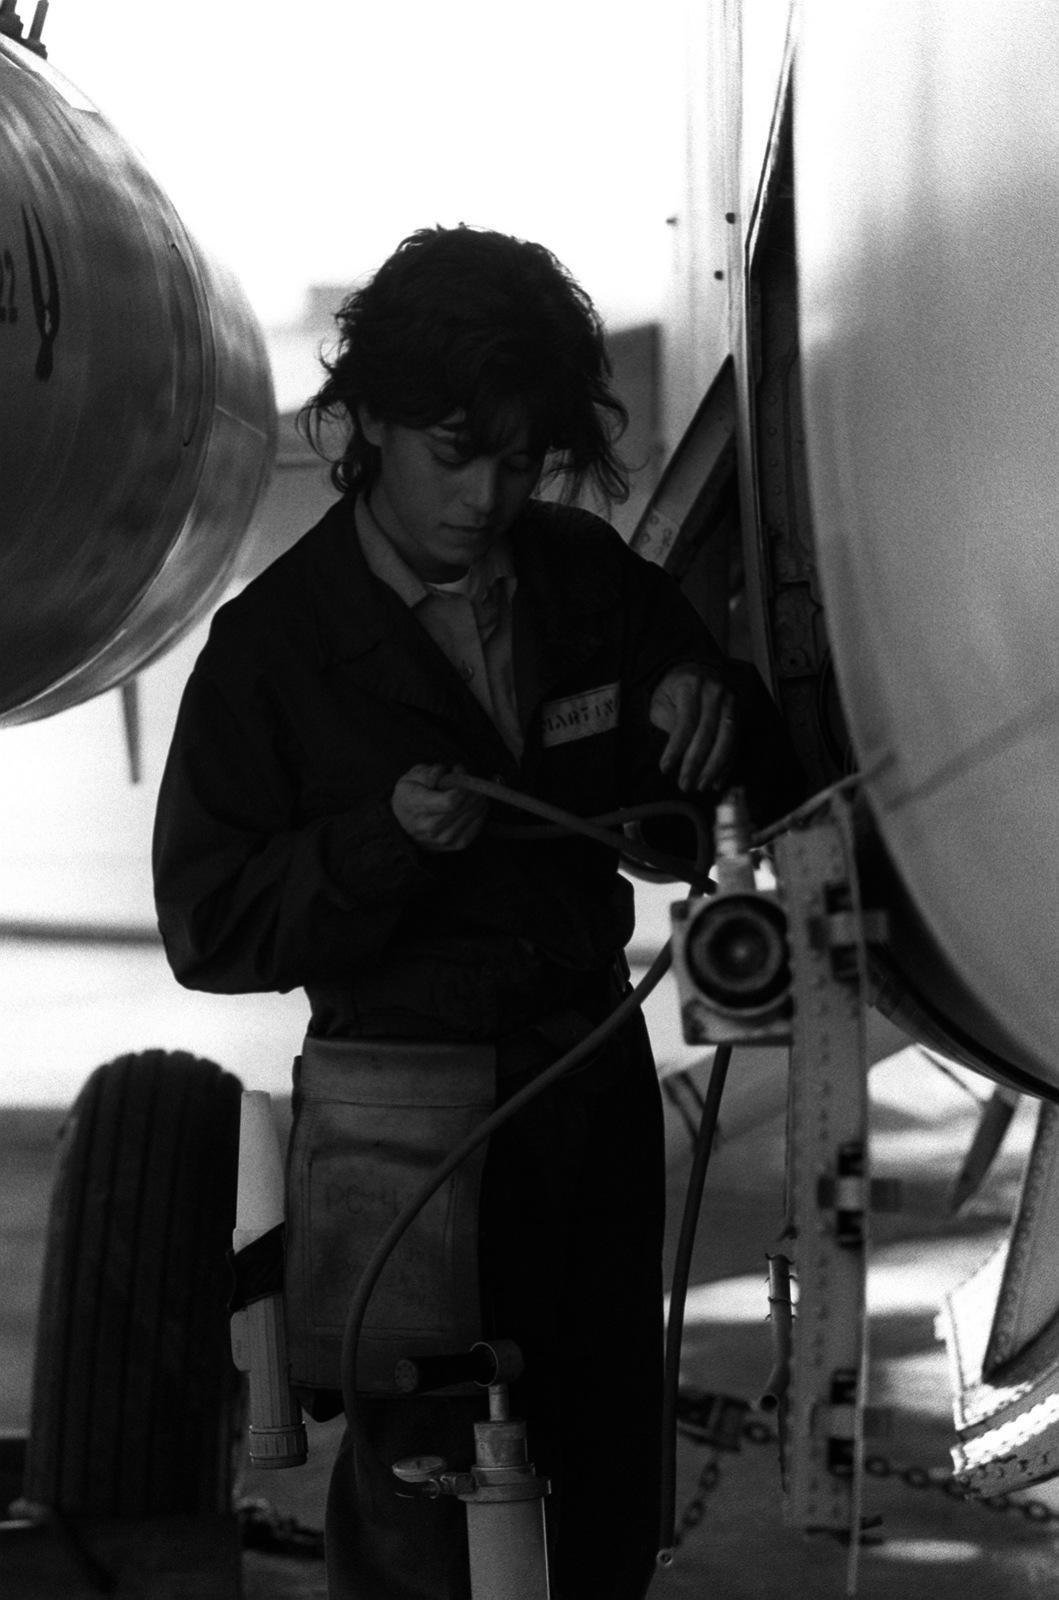 AIRMAN Grisselle Martinez performs routine maintenance on an A-7 Corsair II aircraft